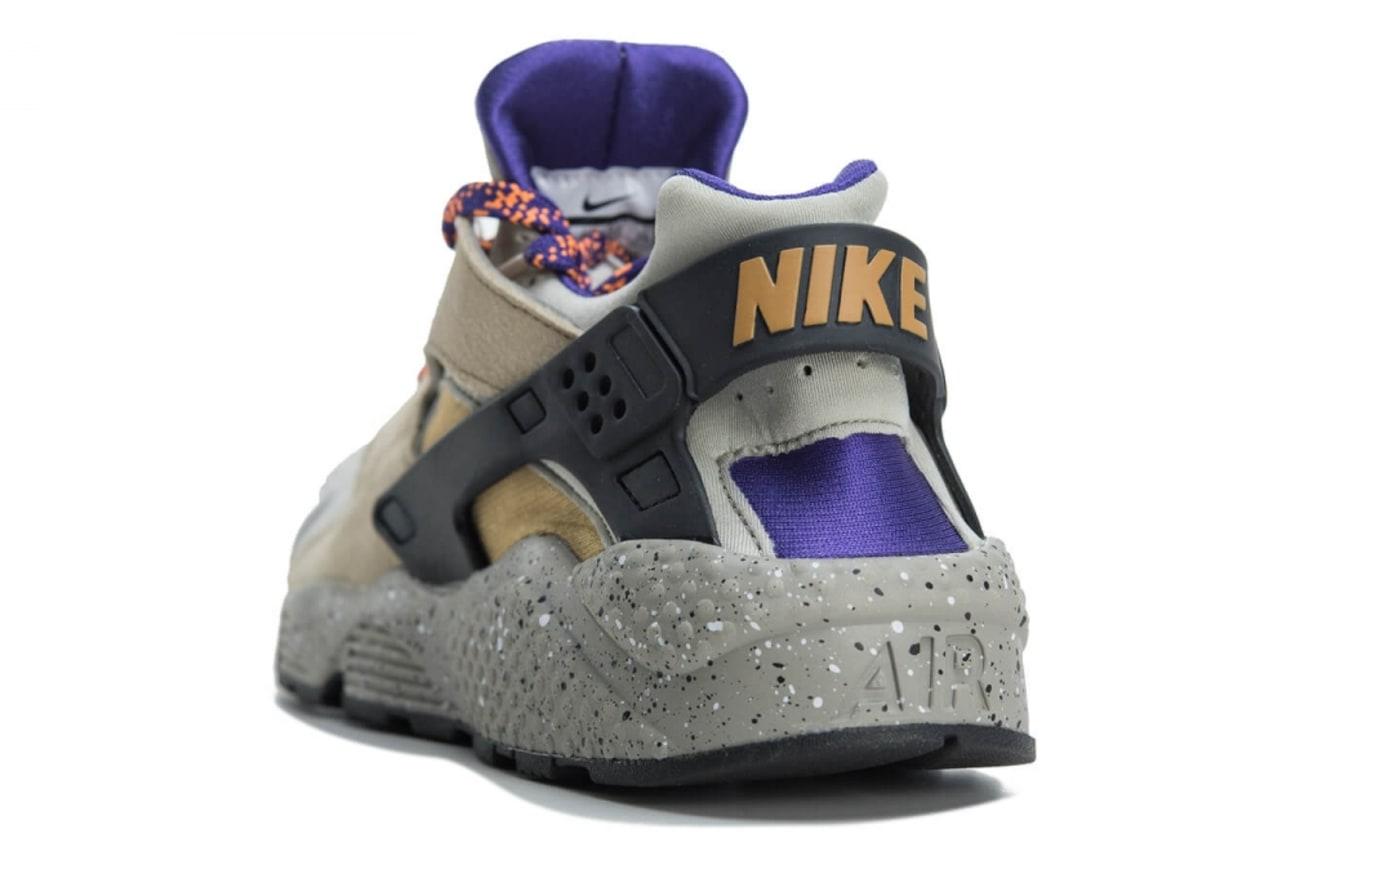 Nike Air Huarache Run Premium 704830-200 (Heel)